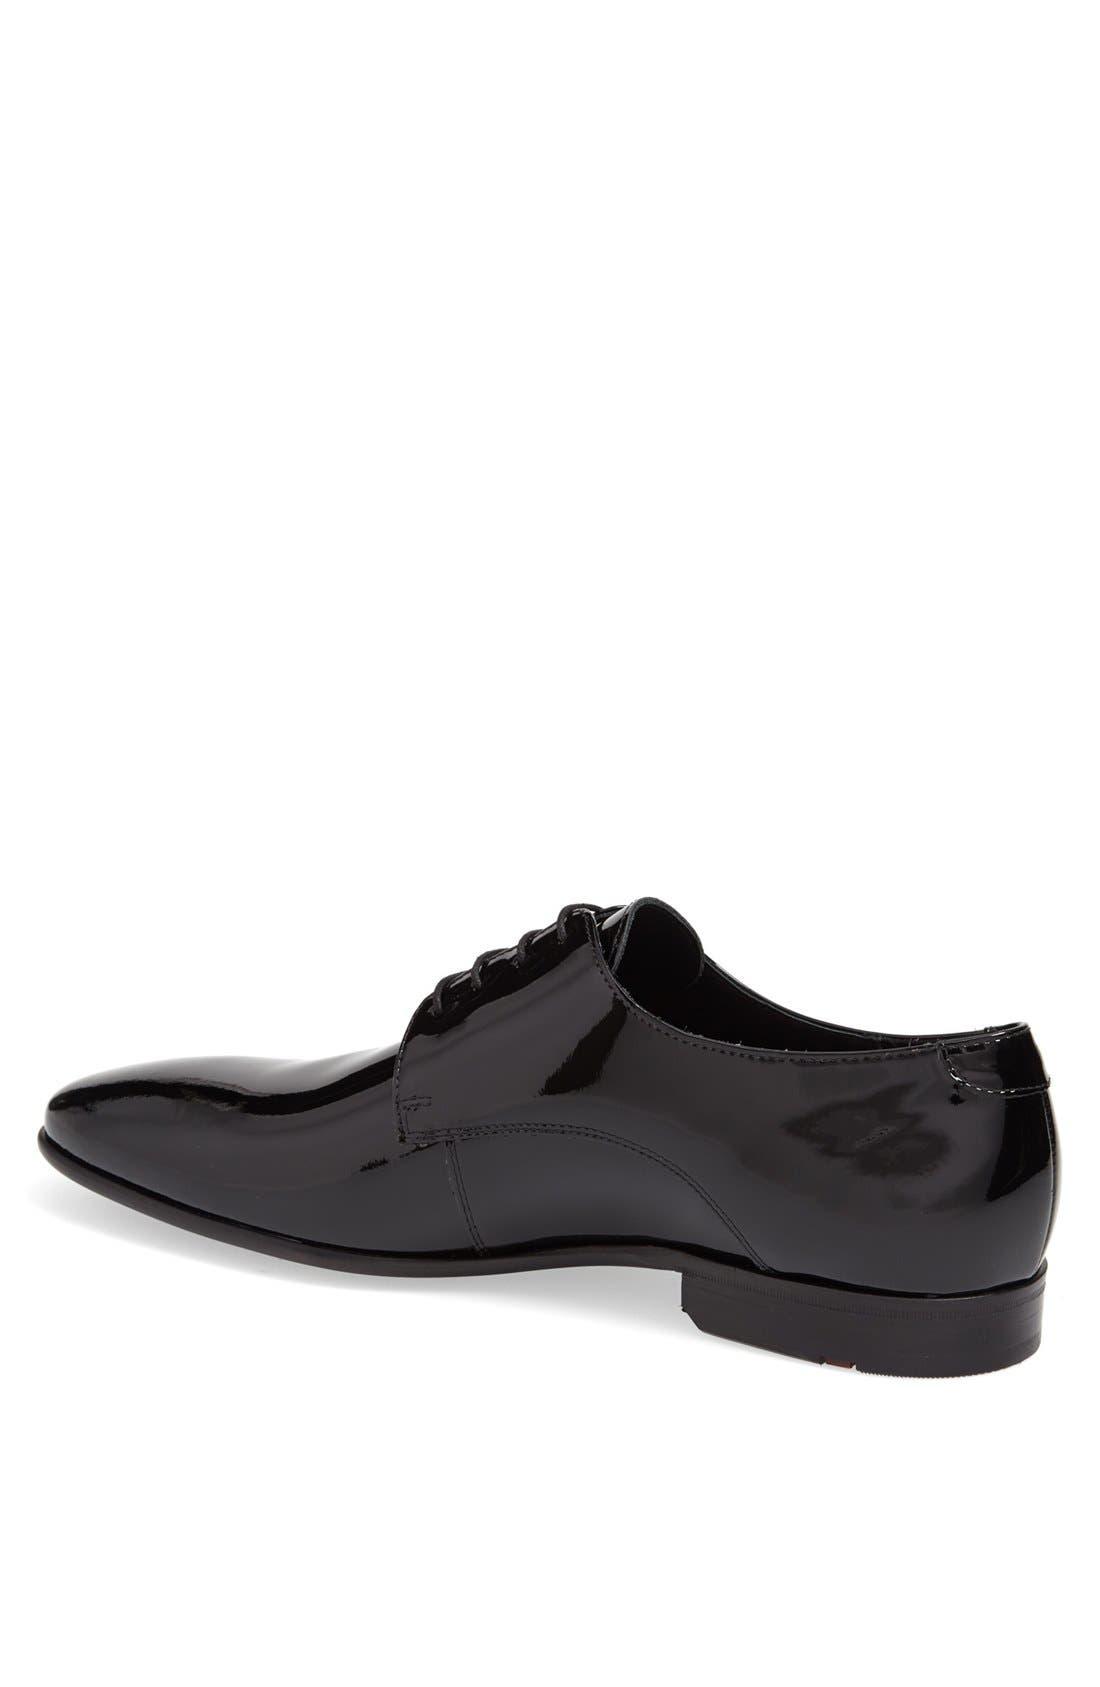 'Jerez' Plain Toe Derby,                             Alternate thumbnail 2, color,                             Black Patent